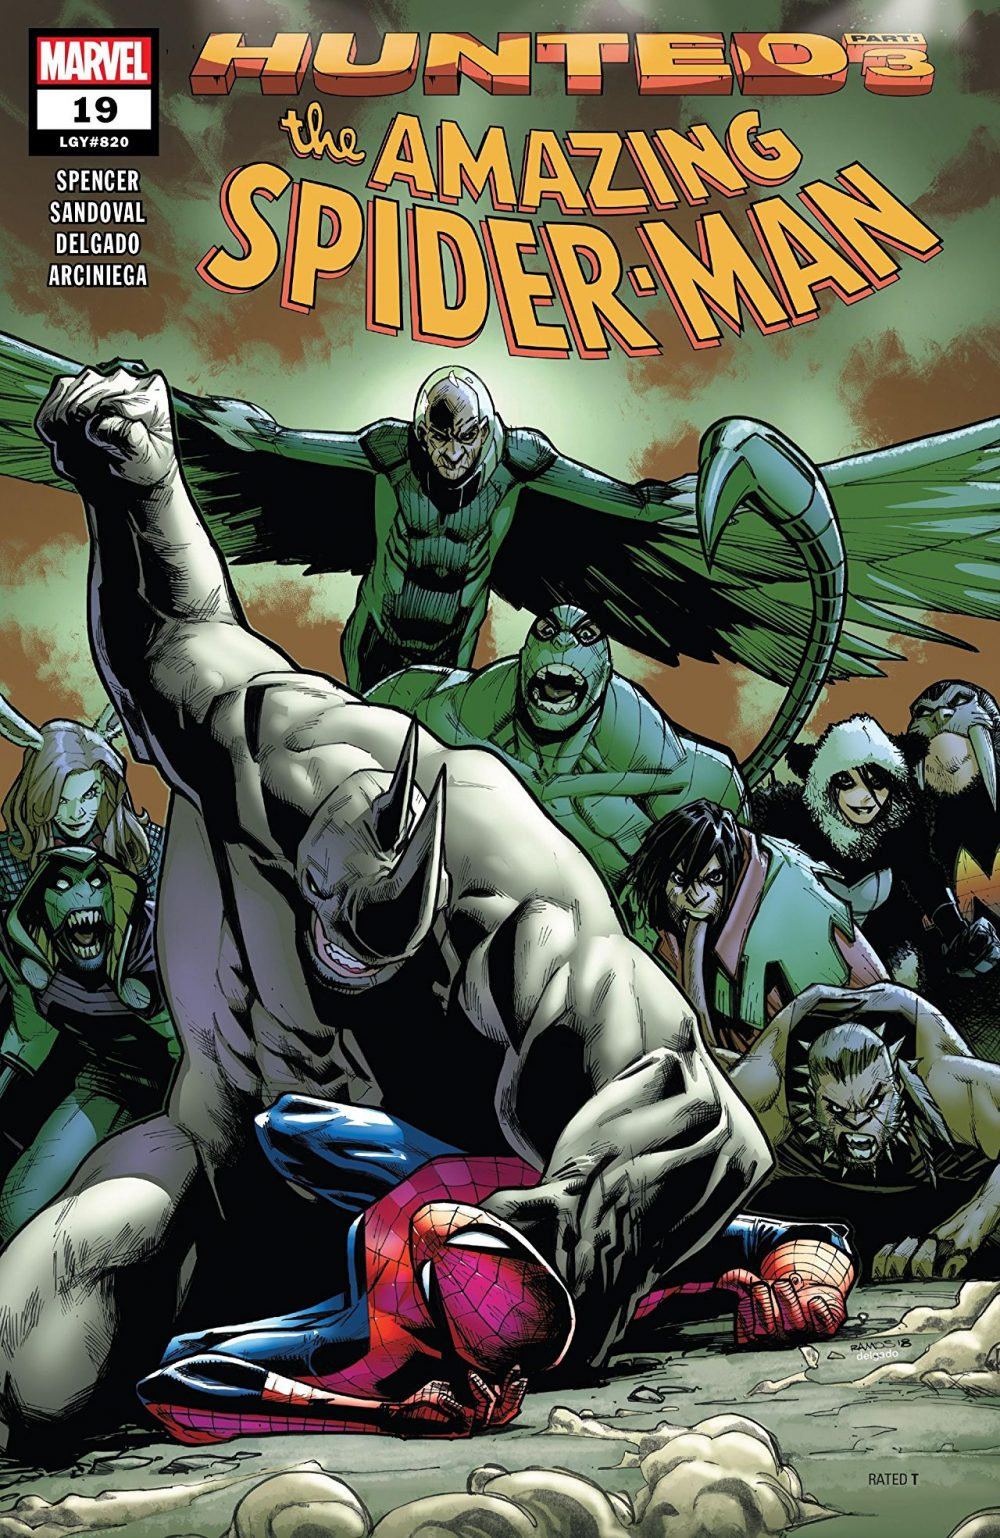 Amazing Spider-Man #19, copertina di Humberto Ramos